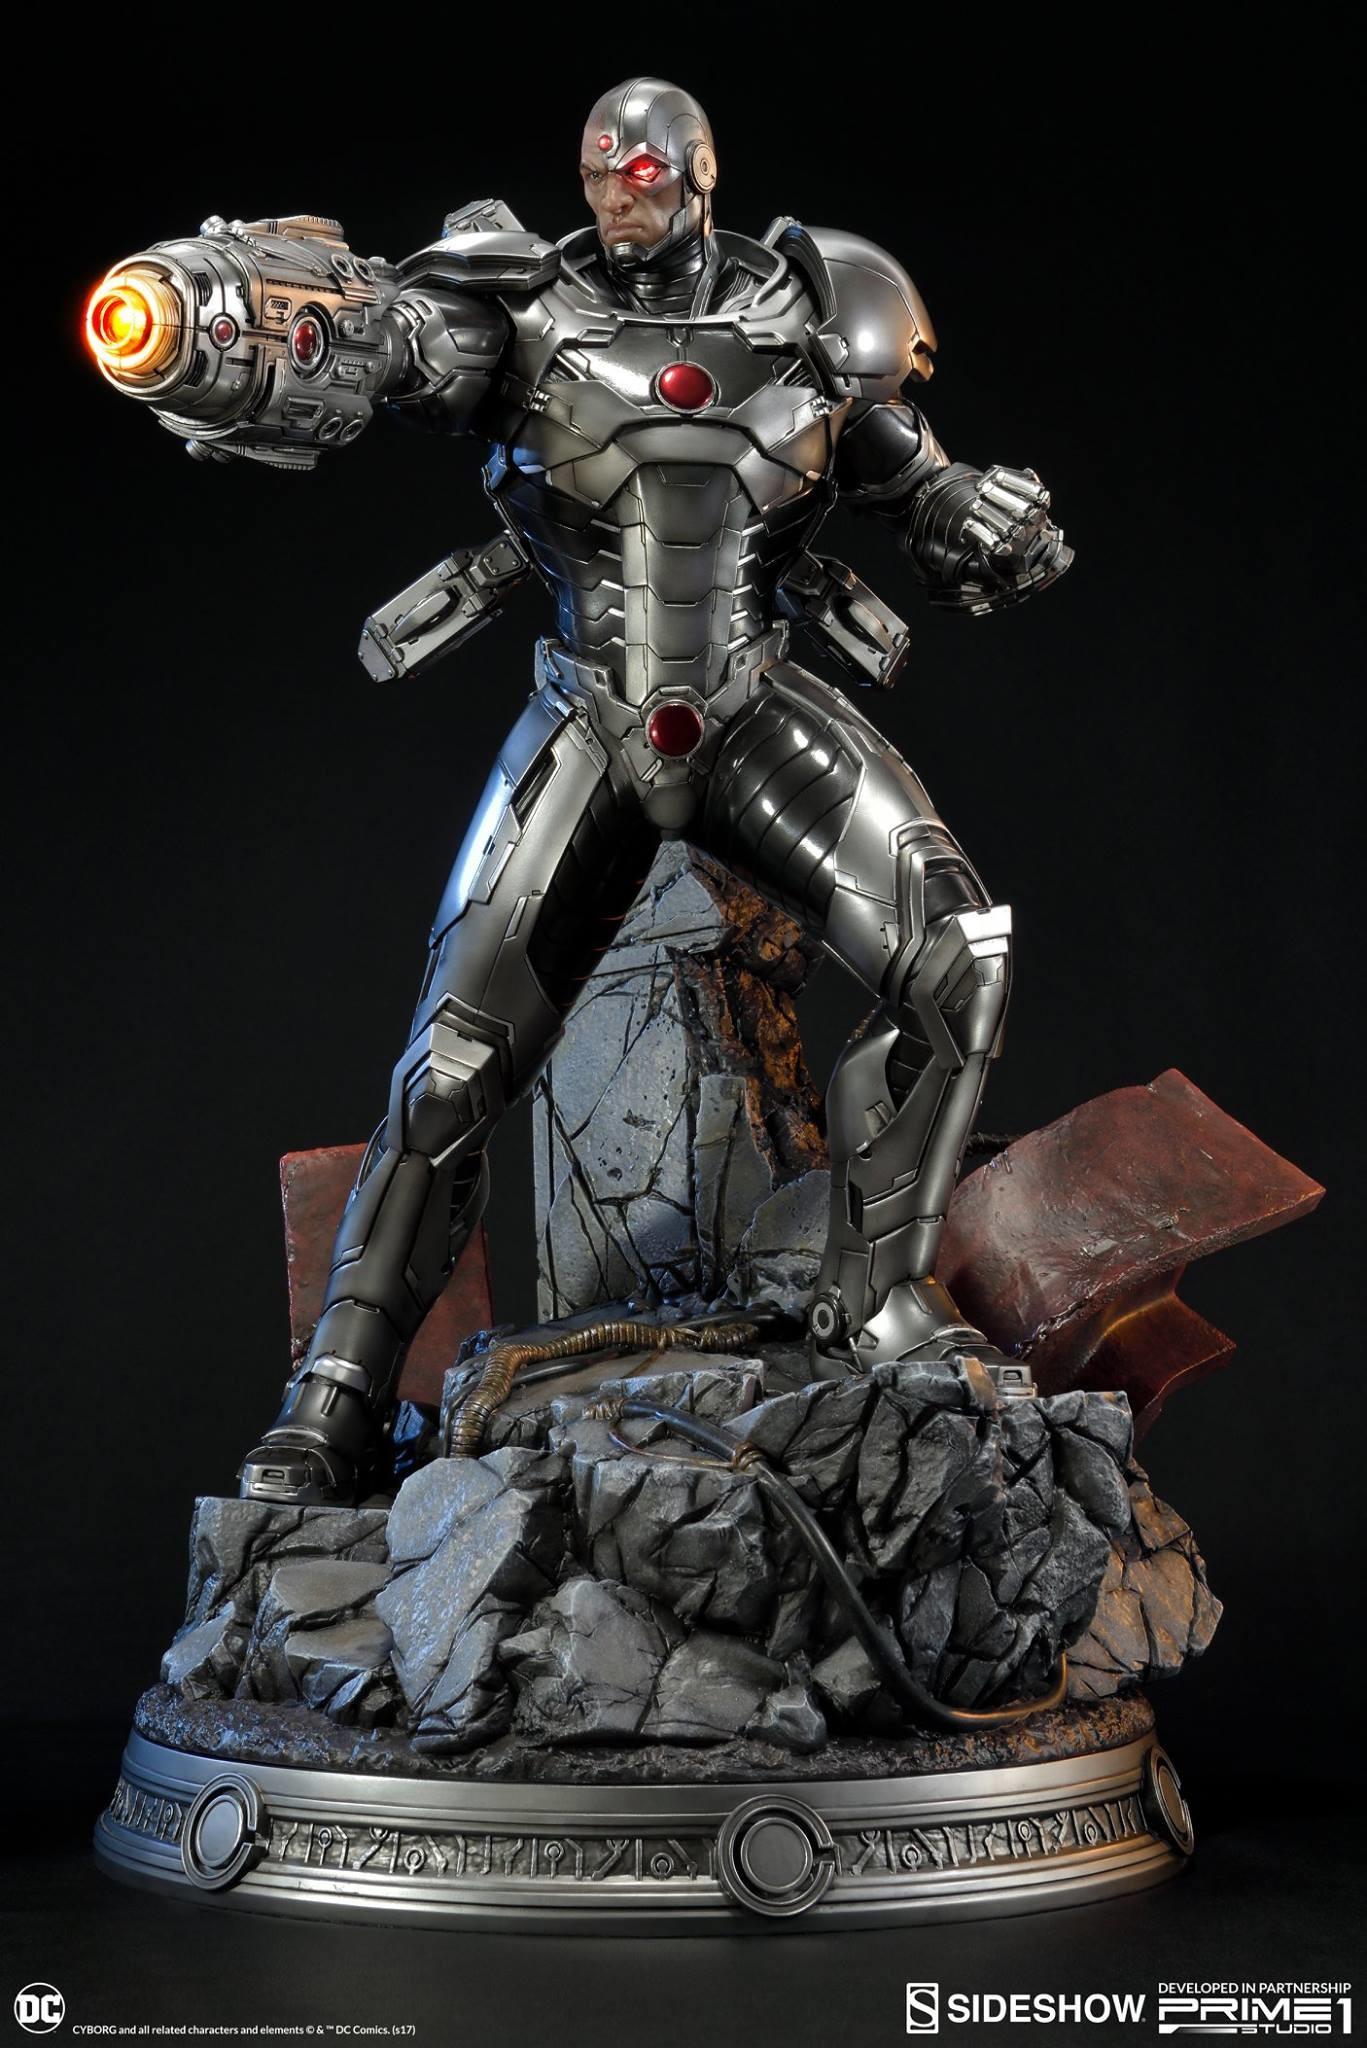 Adam fisher prime 1 studio dc cyborg statue 008